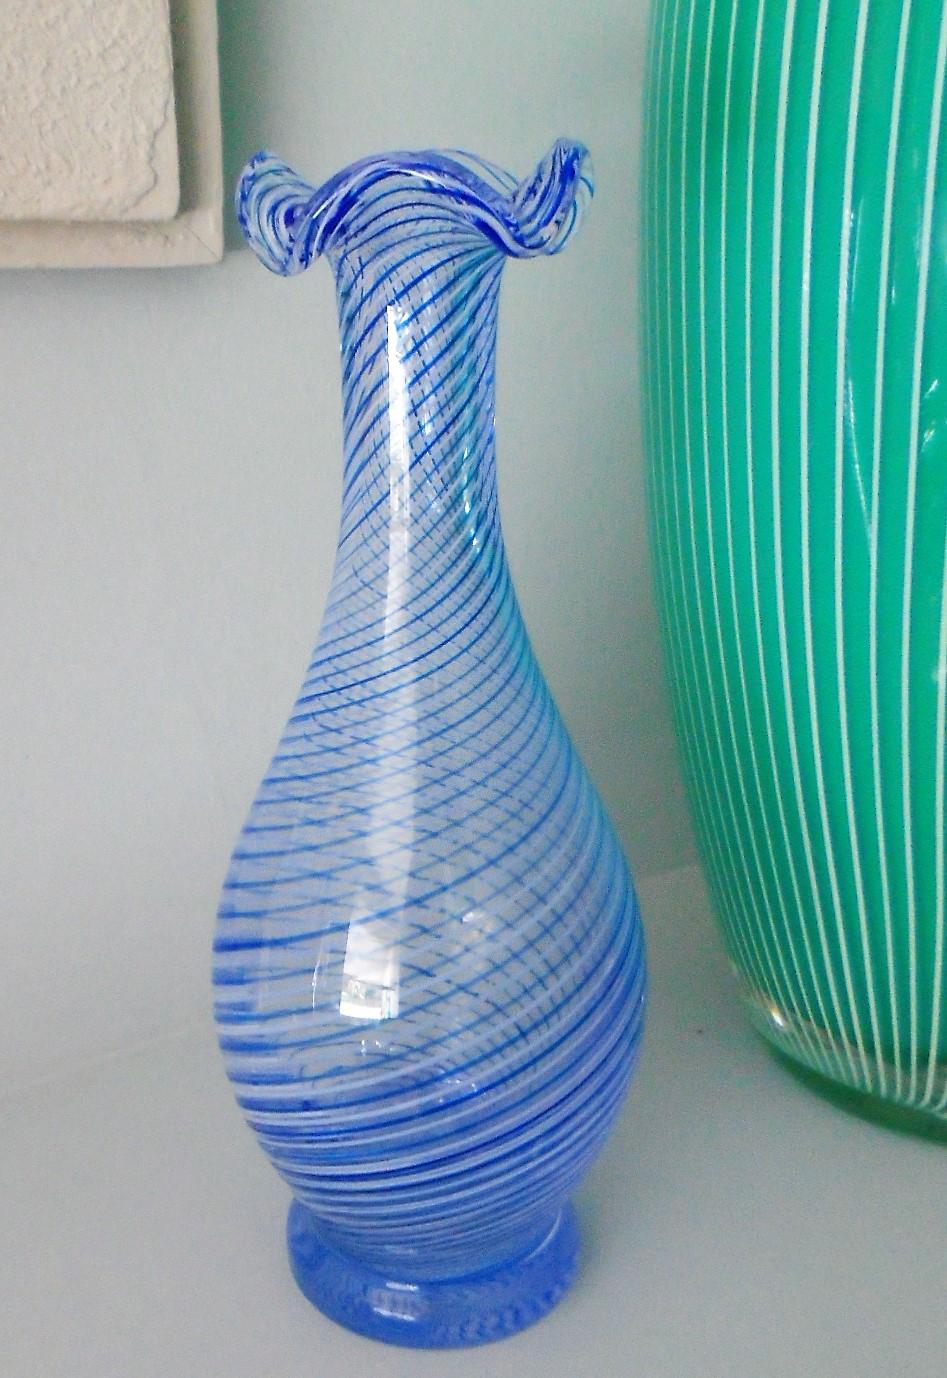 "Cesmi-I Bulbul ""Nightingale's Eye'"" Glass Vase Turkish"